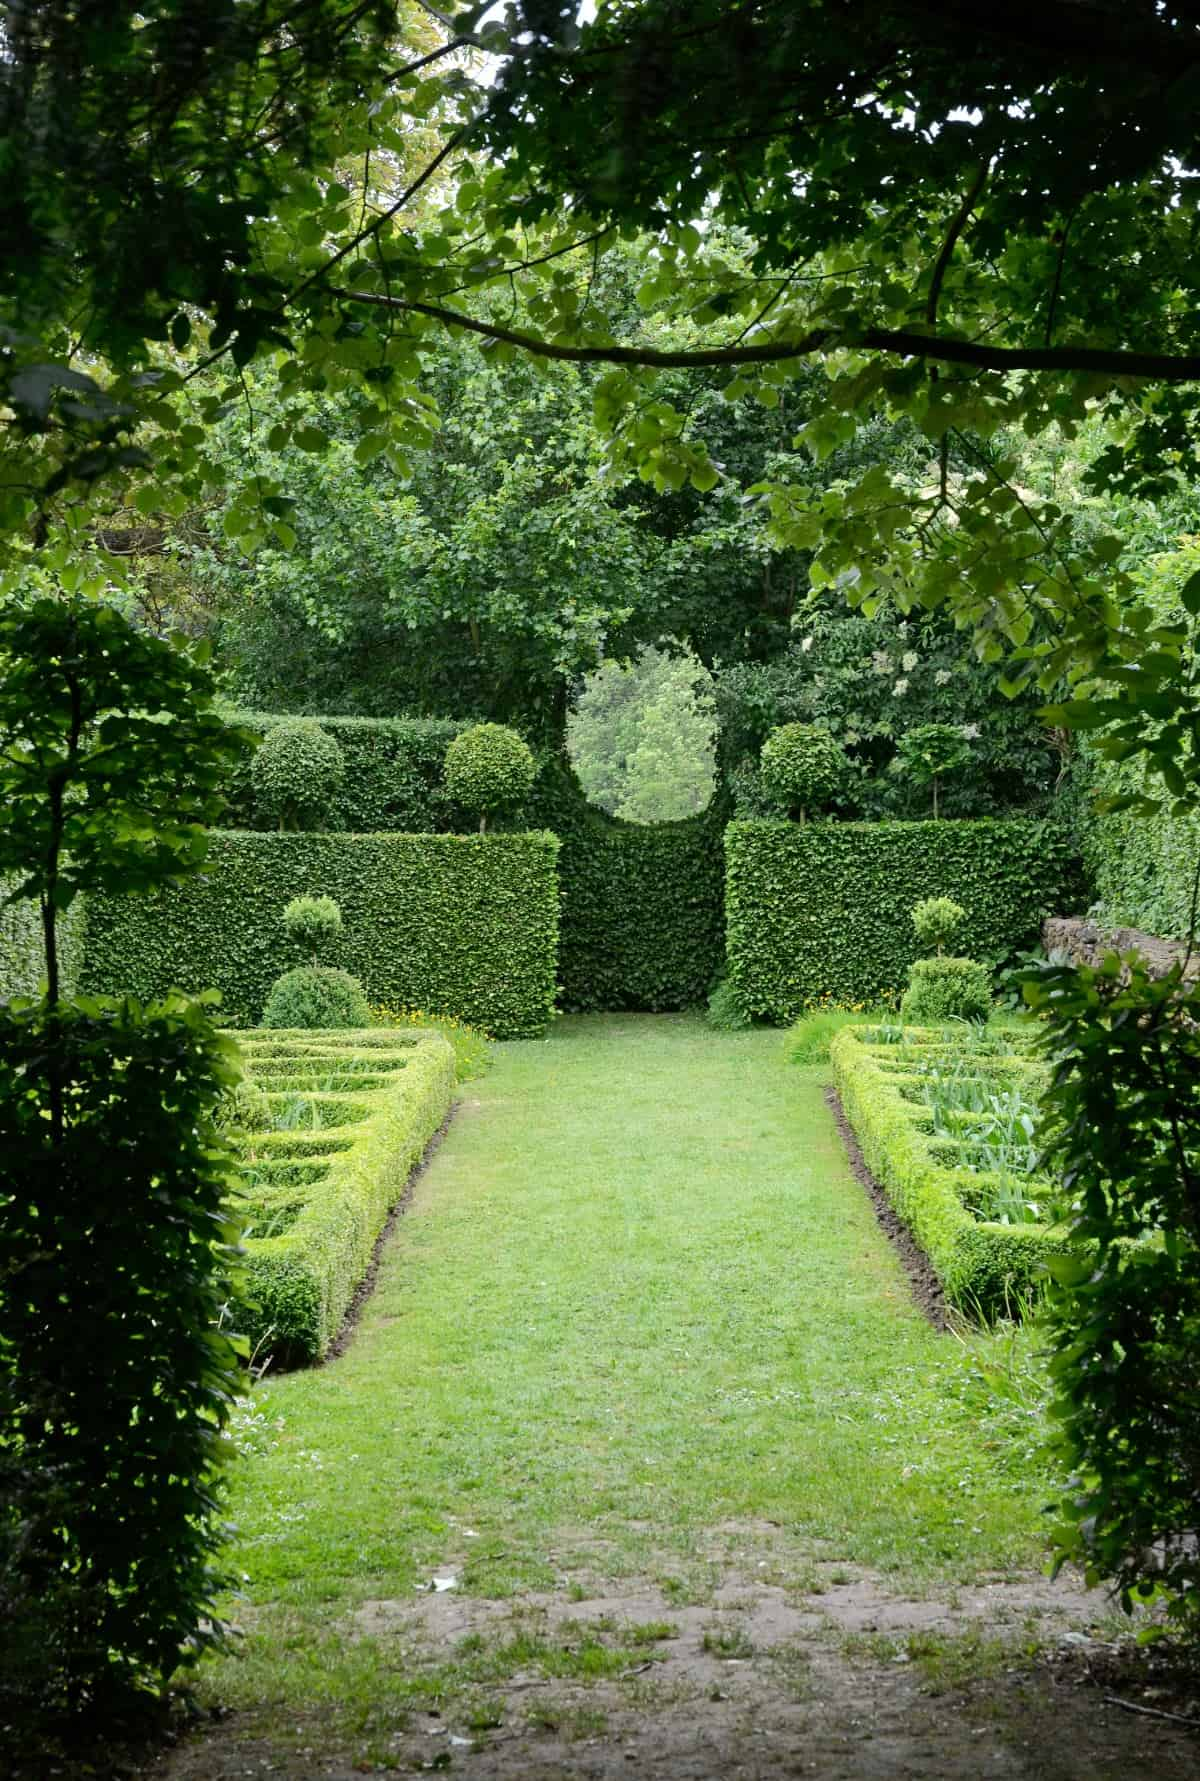 Lush knot garden